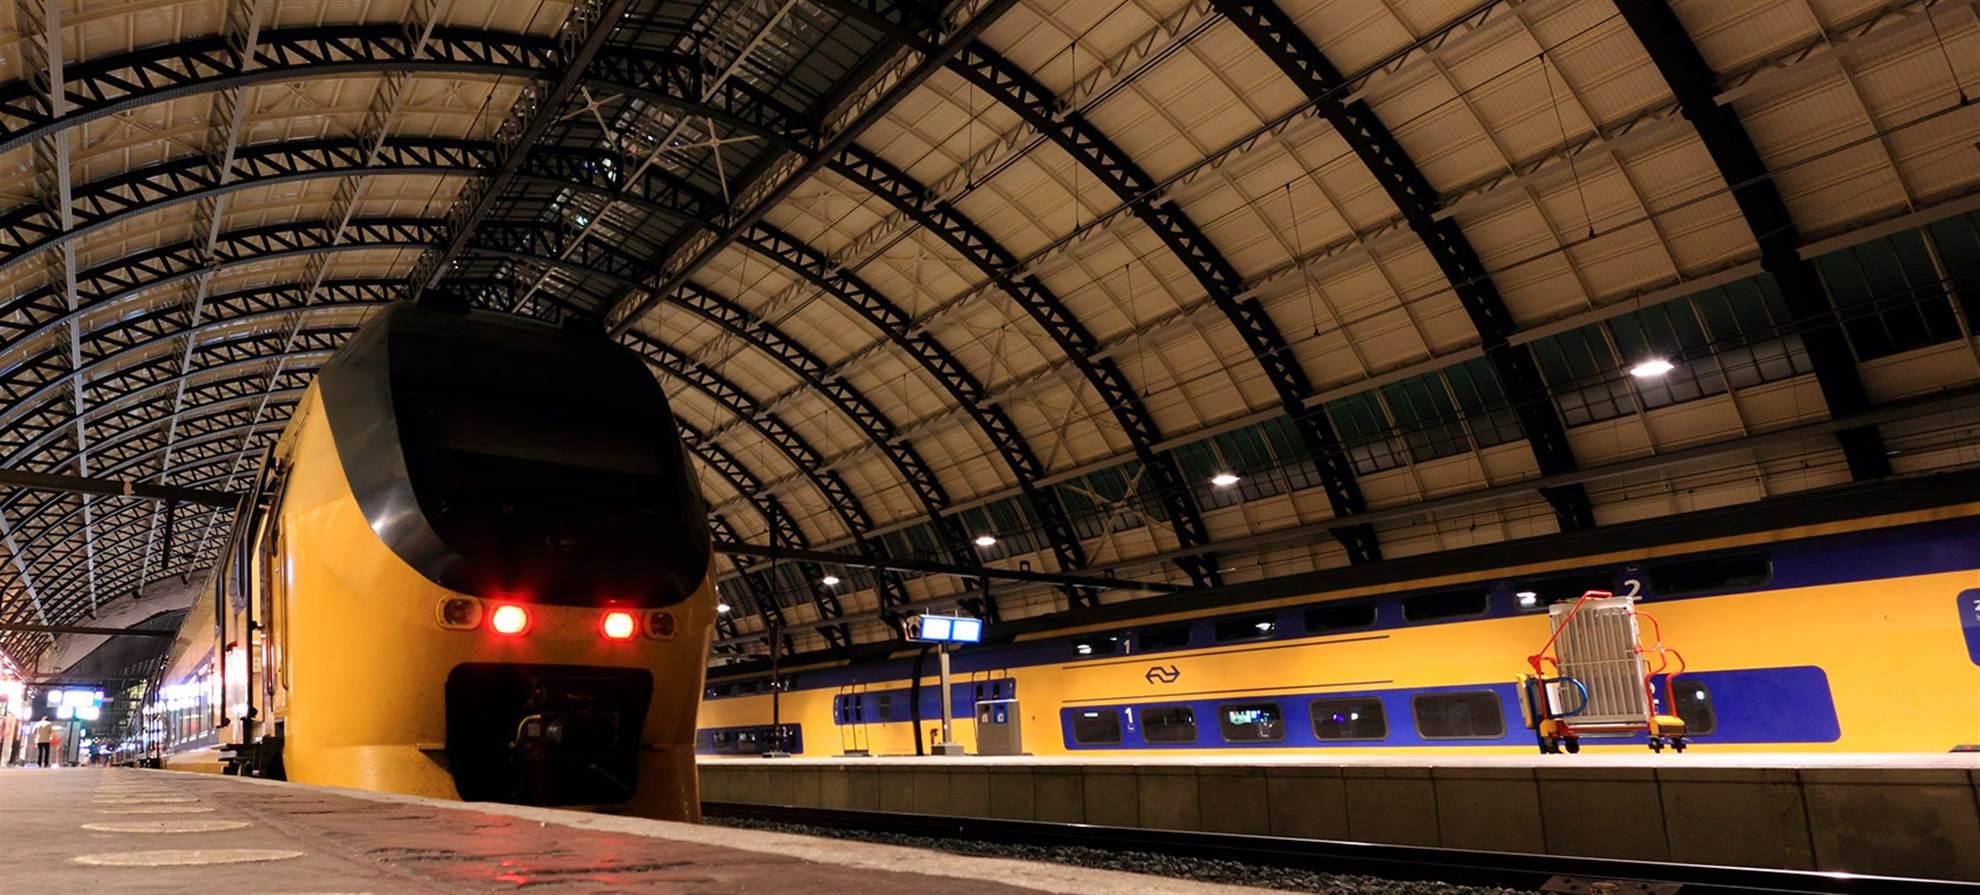 Поезд из аэропорта Схипхол до Амстердама